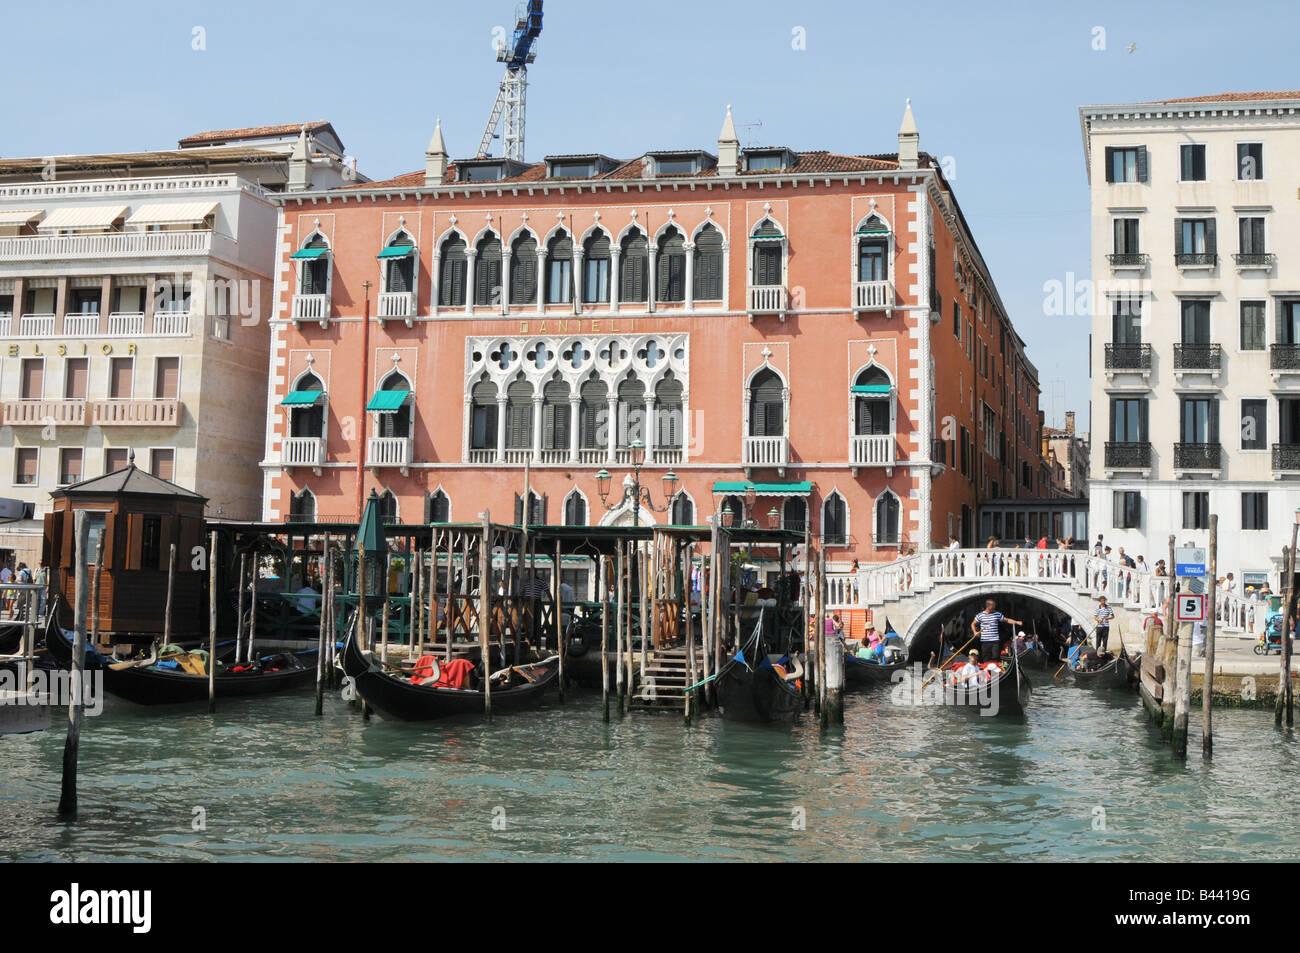 Danieli Hotel Stockfotos & Danieli Hotel Bilder - Alamy